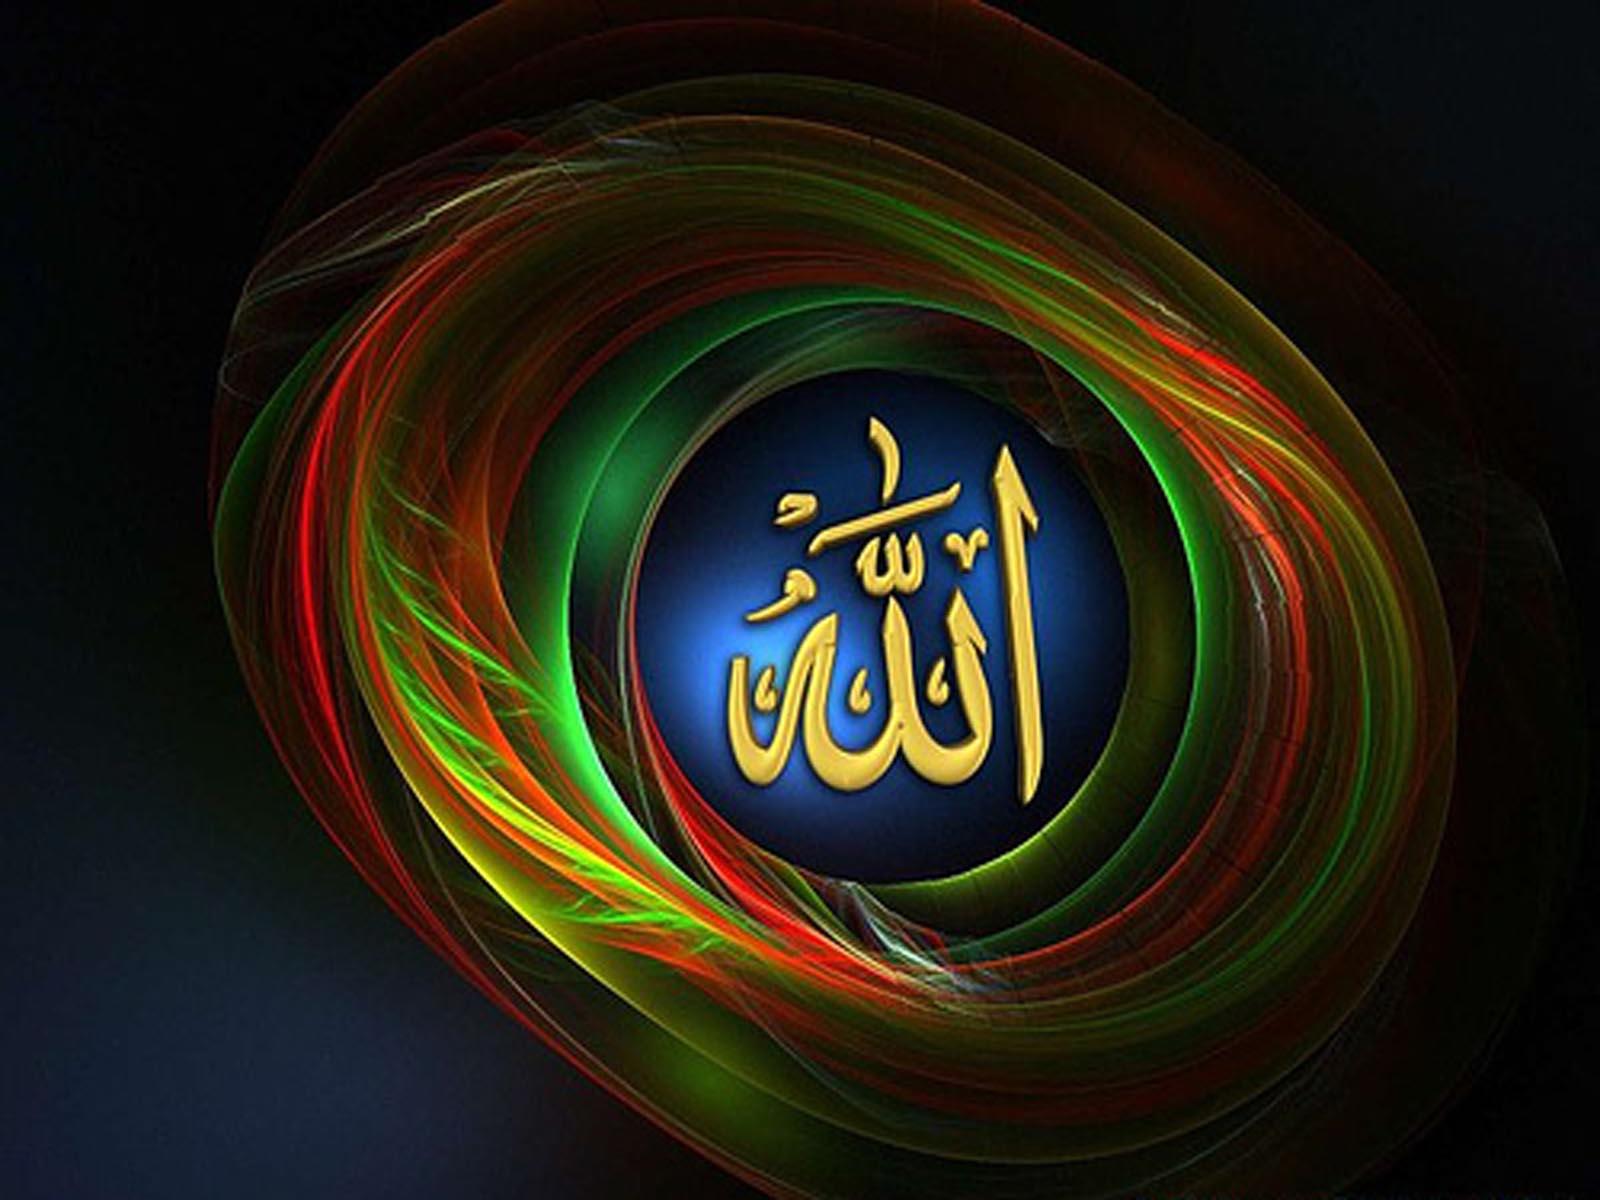 islamic wallpapers: ALLAHalll name wallpapers